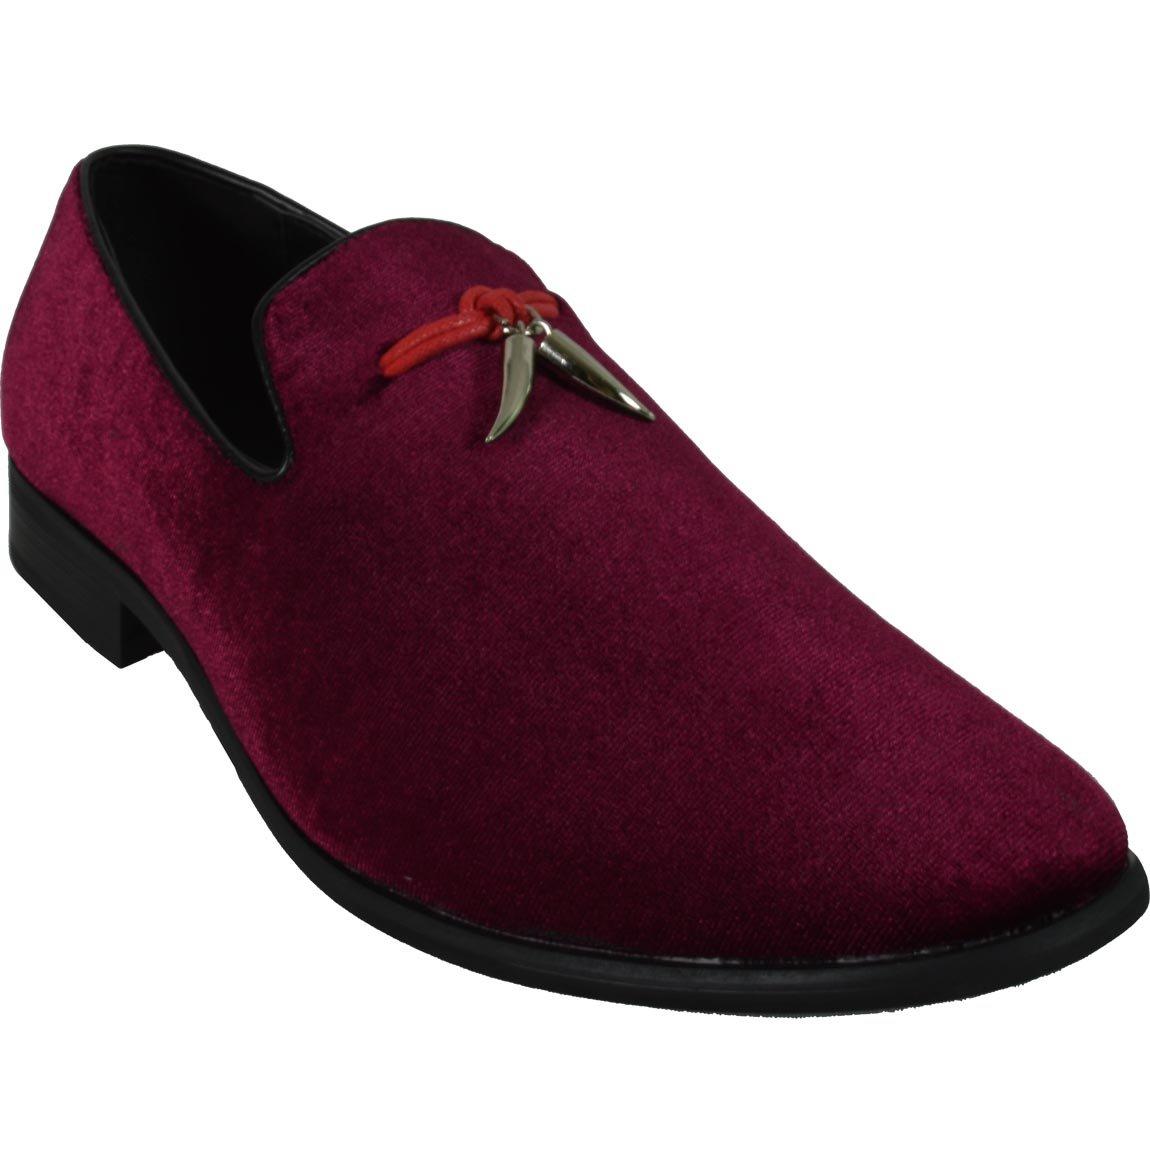 Sedagatti Men's Formal Shoes Casual Loafer Slip-On SED4013 (8.5, Wine) by Sedagatti (Image #3)